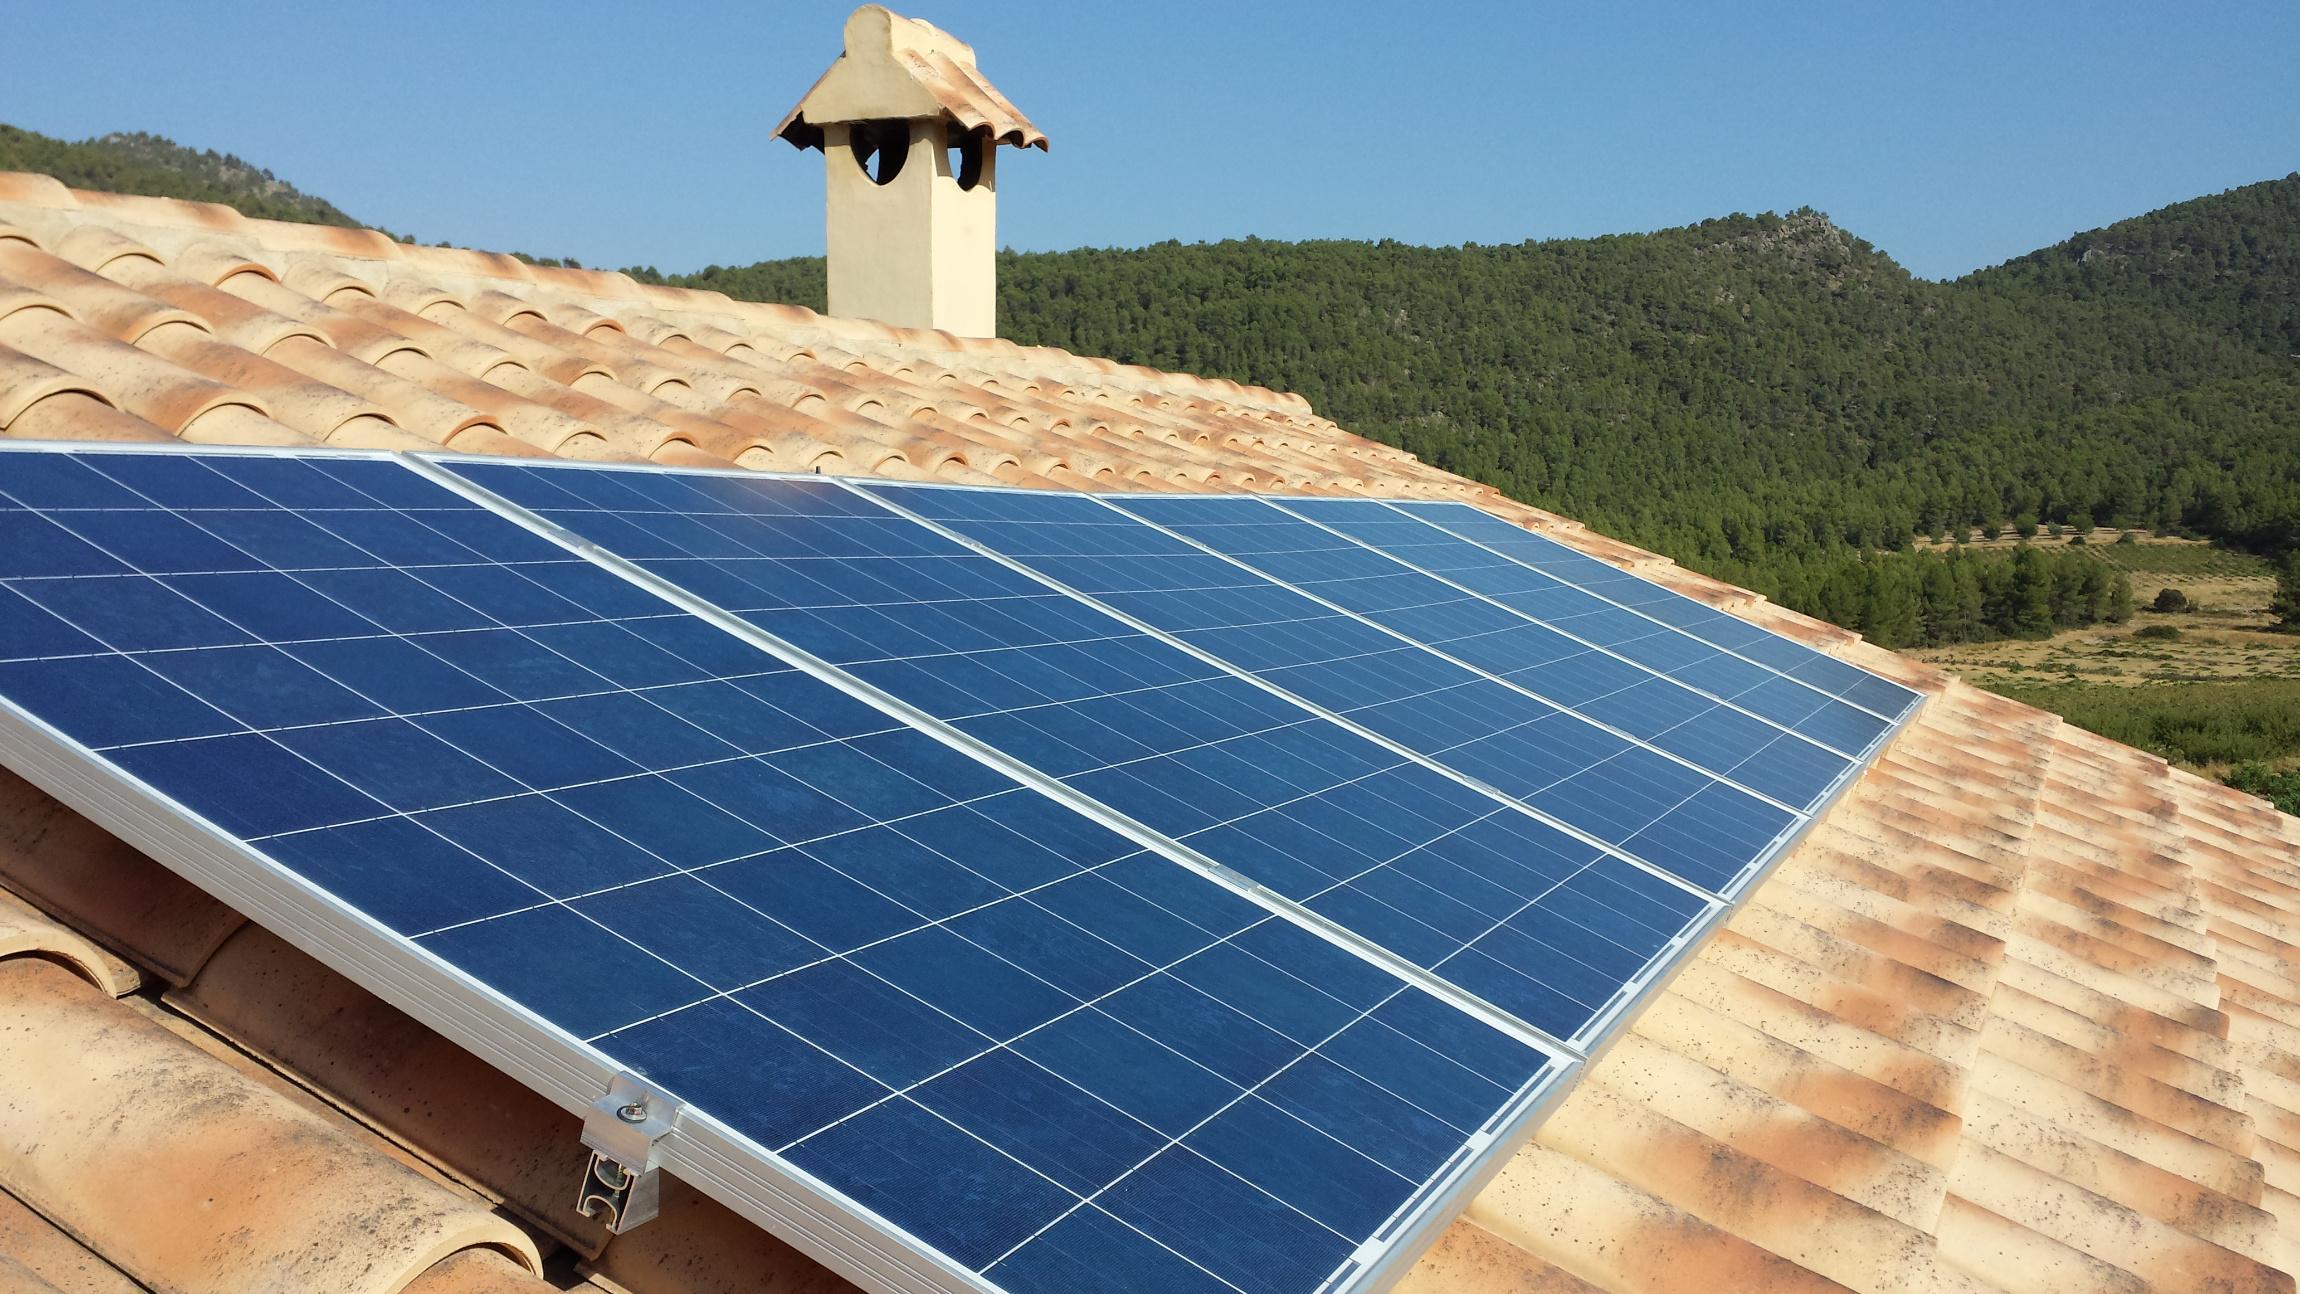 Domosolar instaladores de energ a solar fotovoltaica en for Baterias placas solares